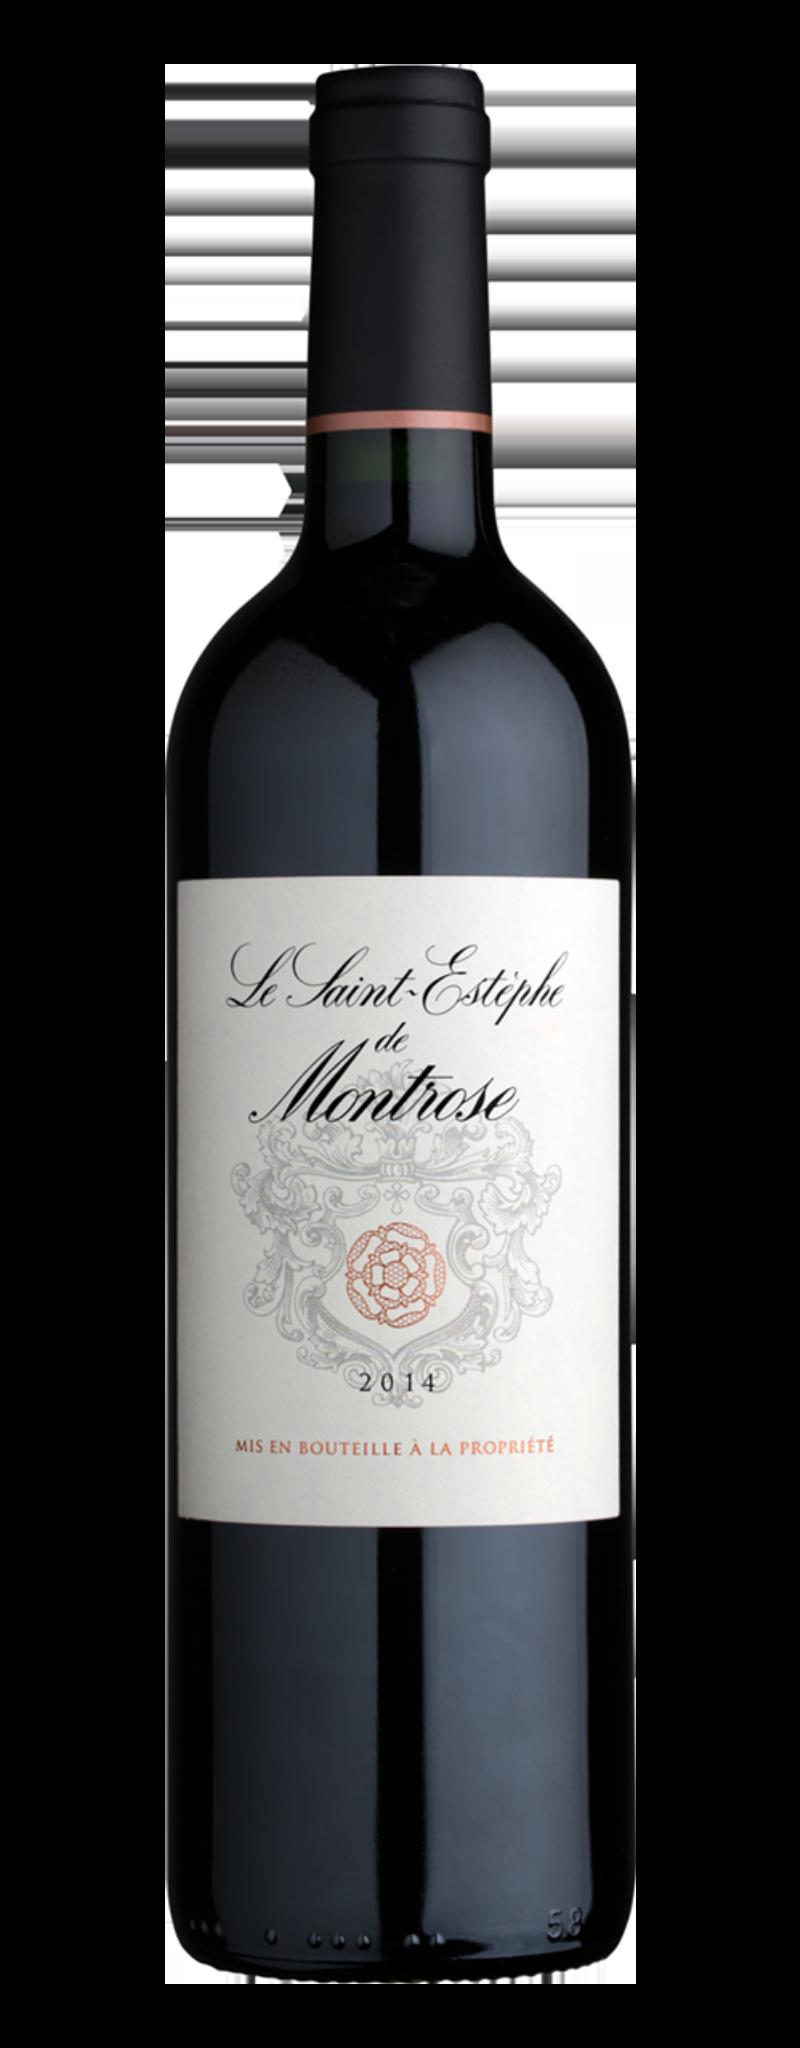 Saint Estephe de Montrose 2014  - 750ml